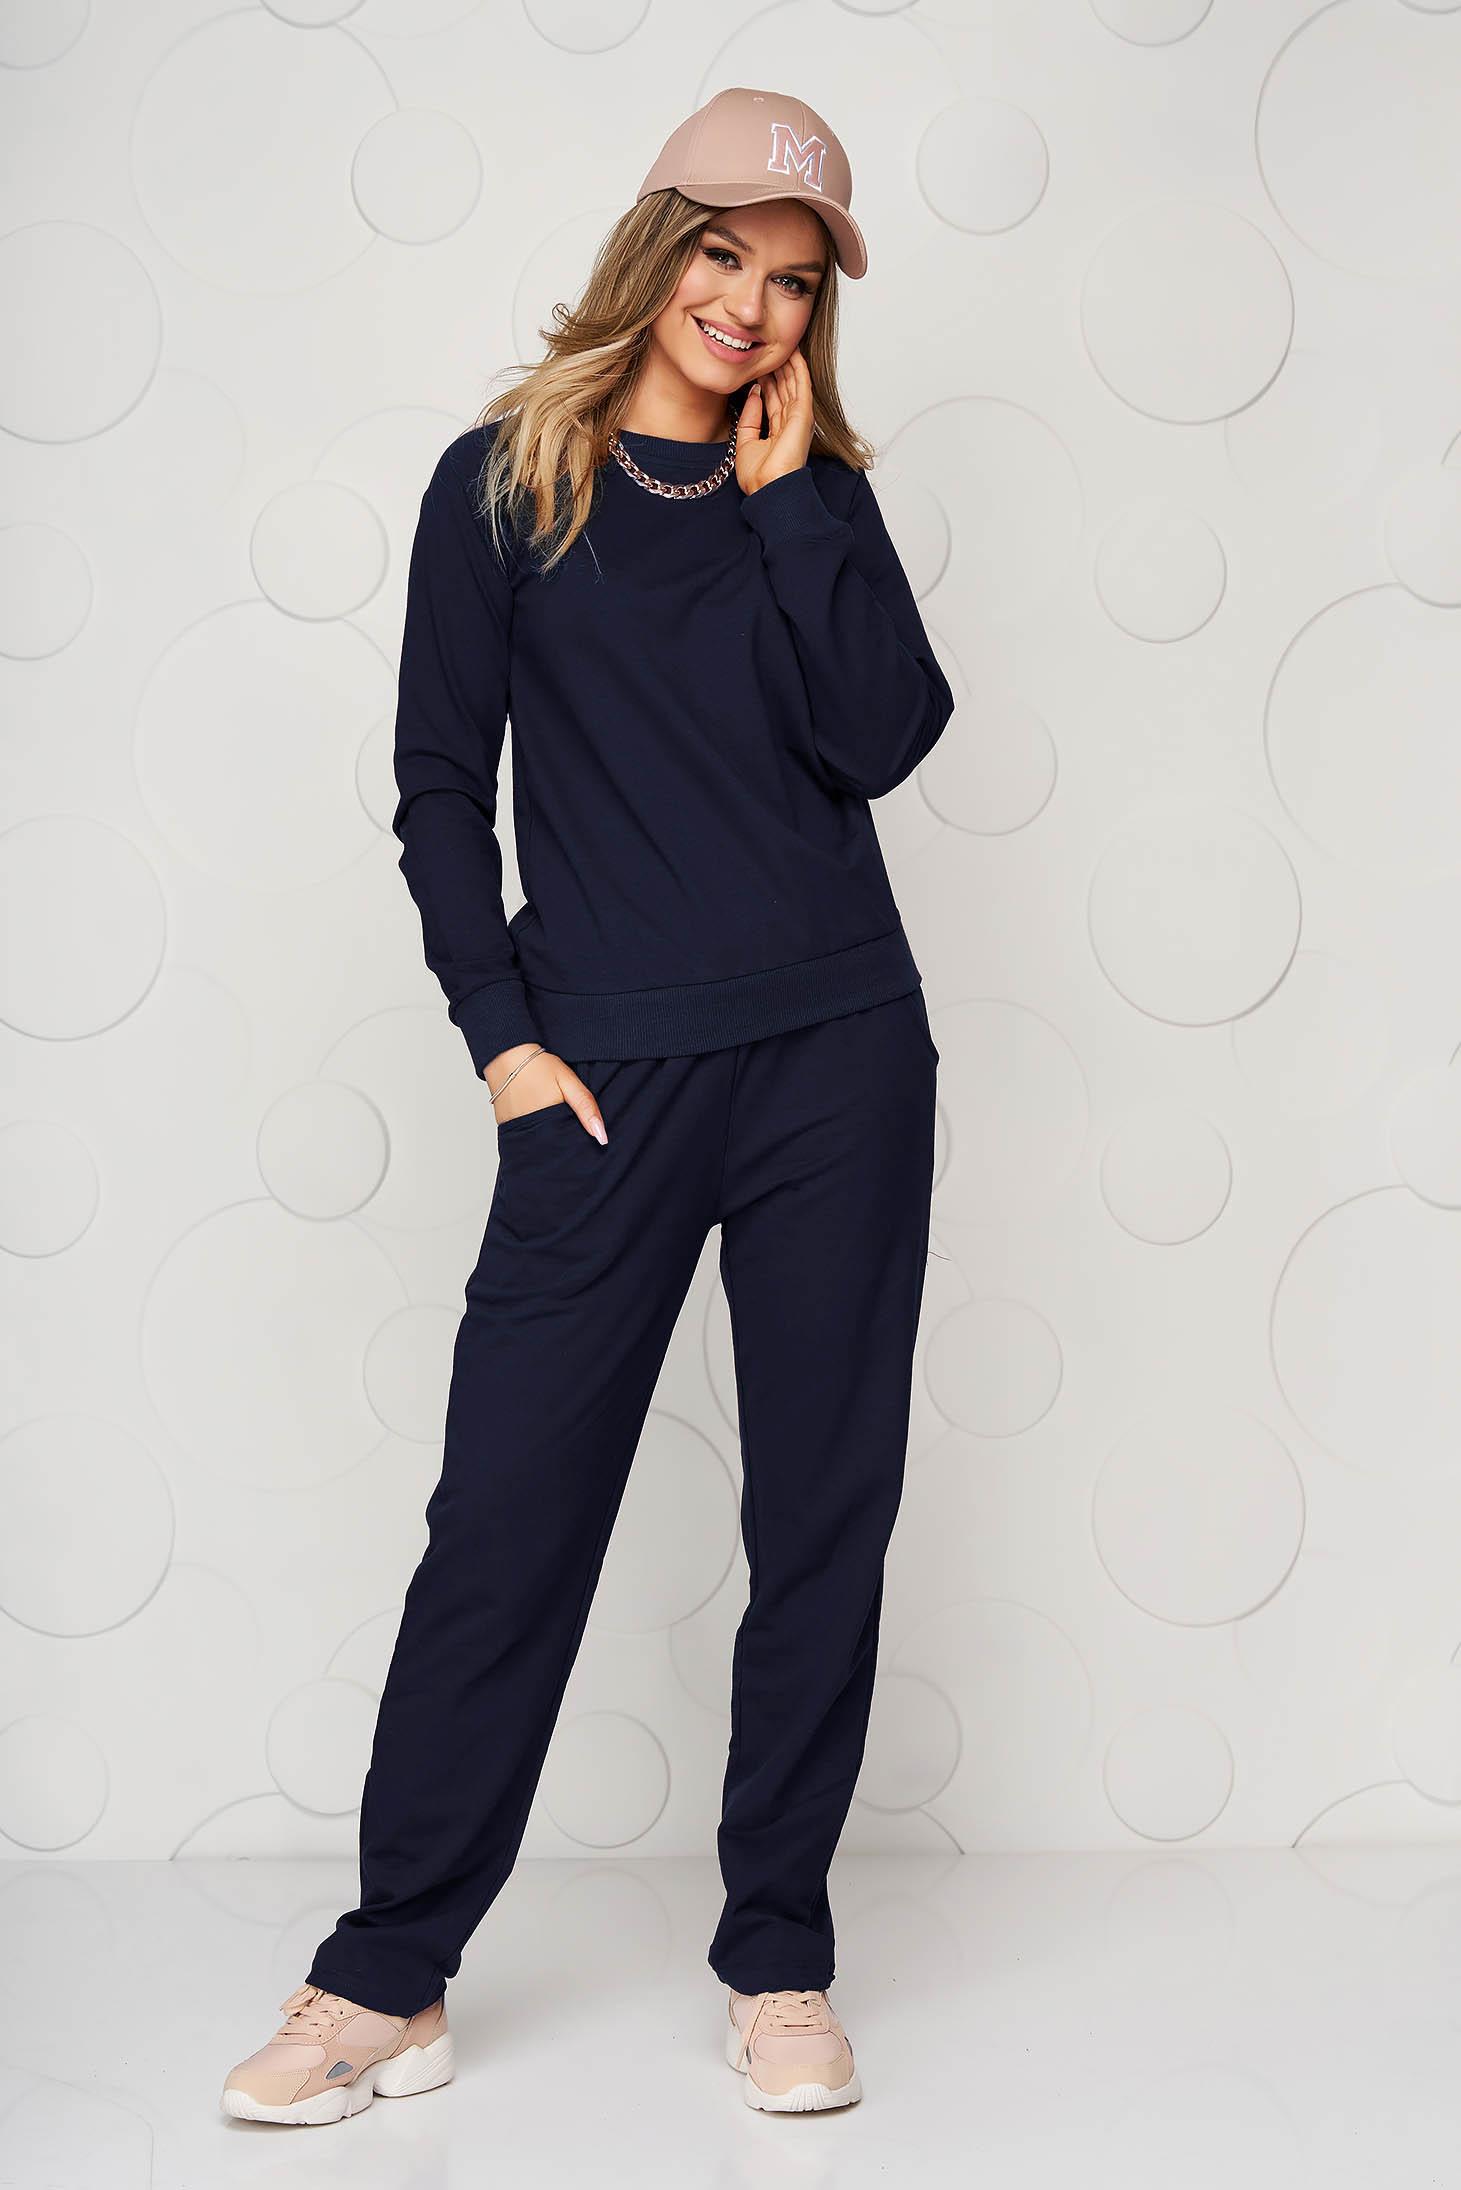 Darkblue sport 2 pieces cotton casual loose fit